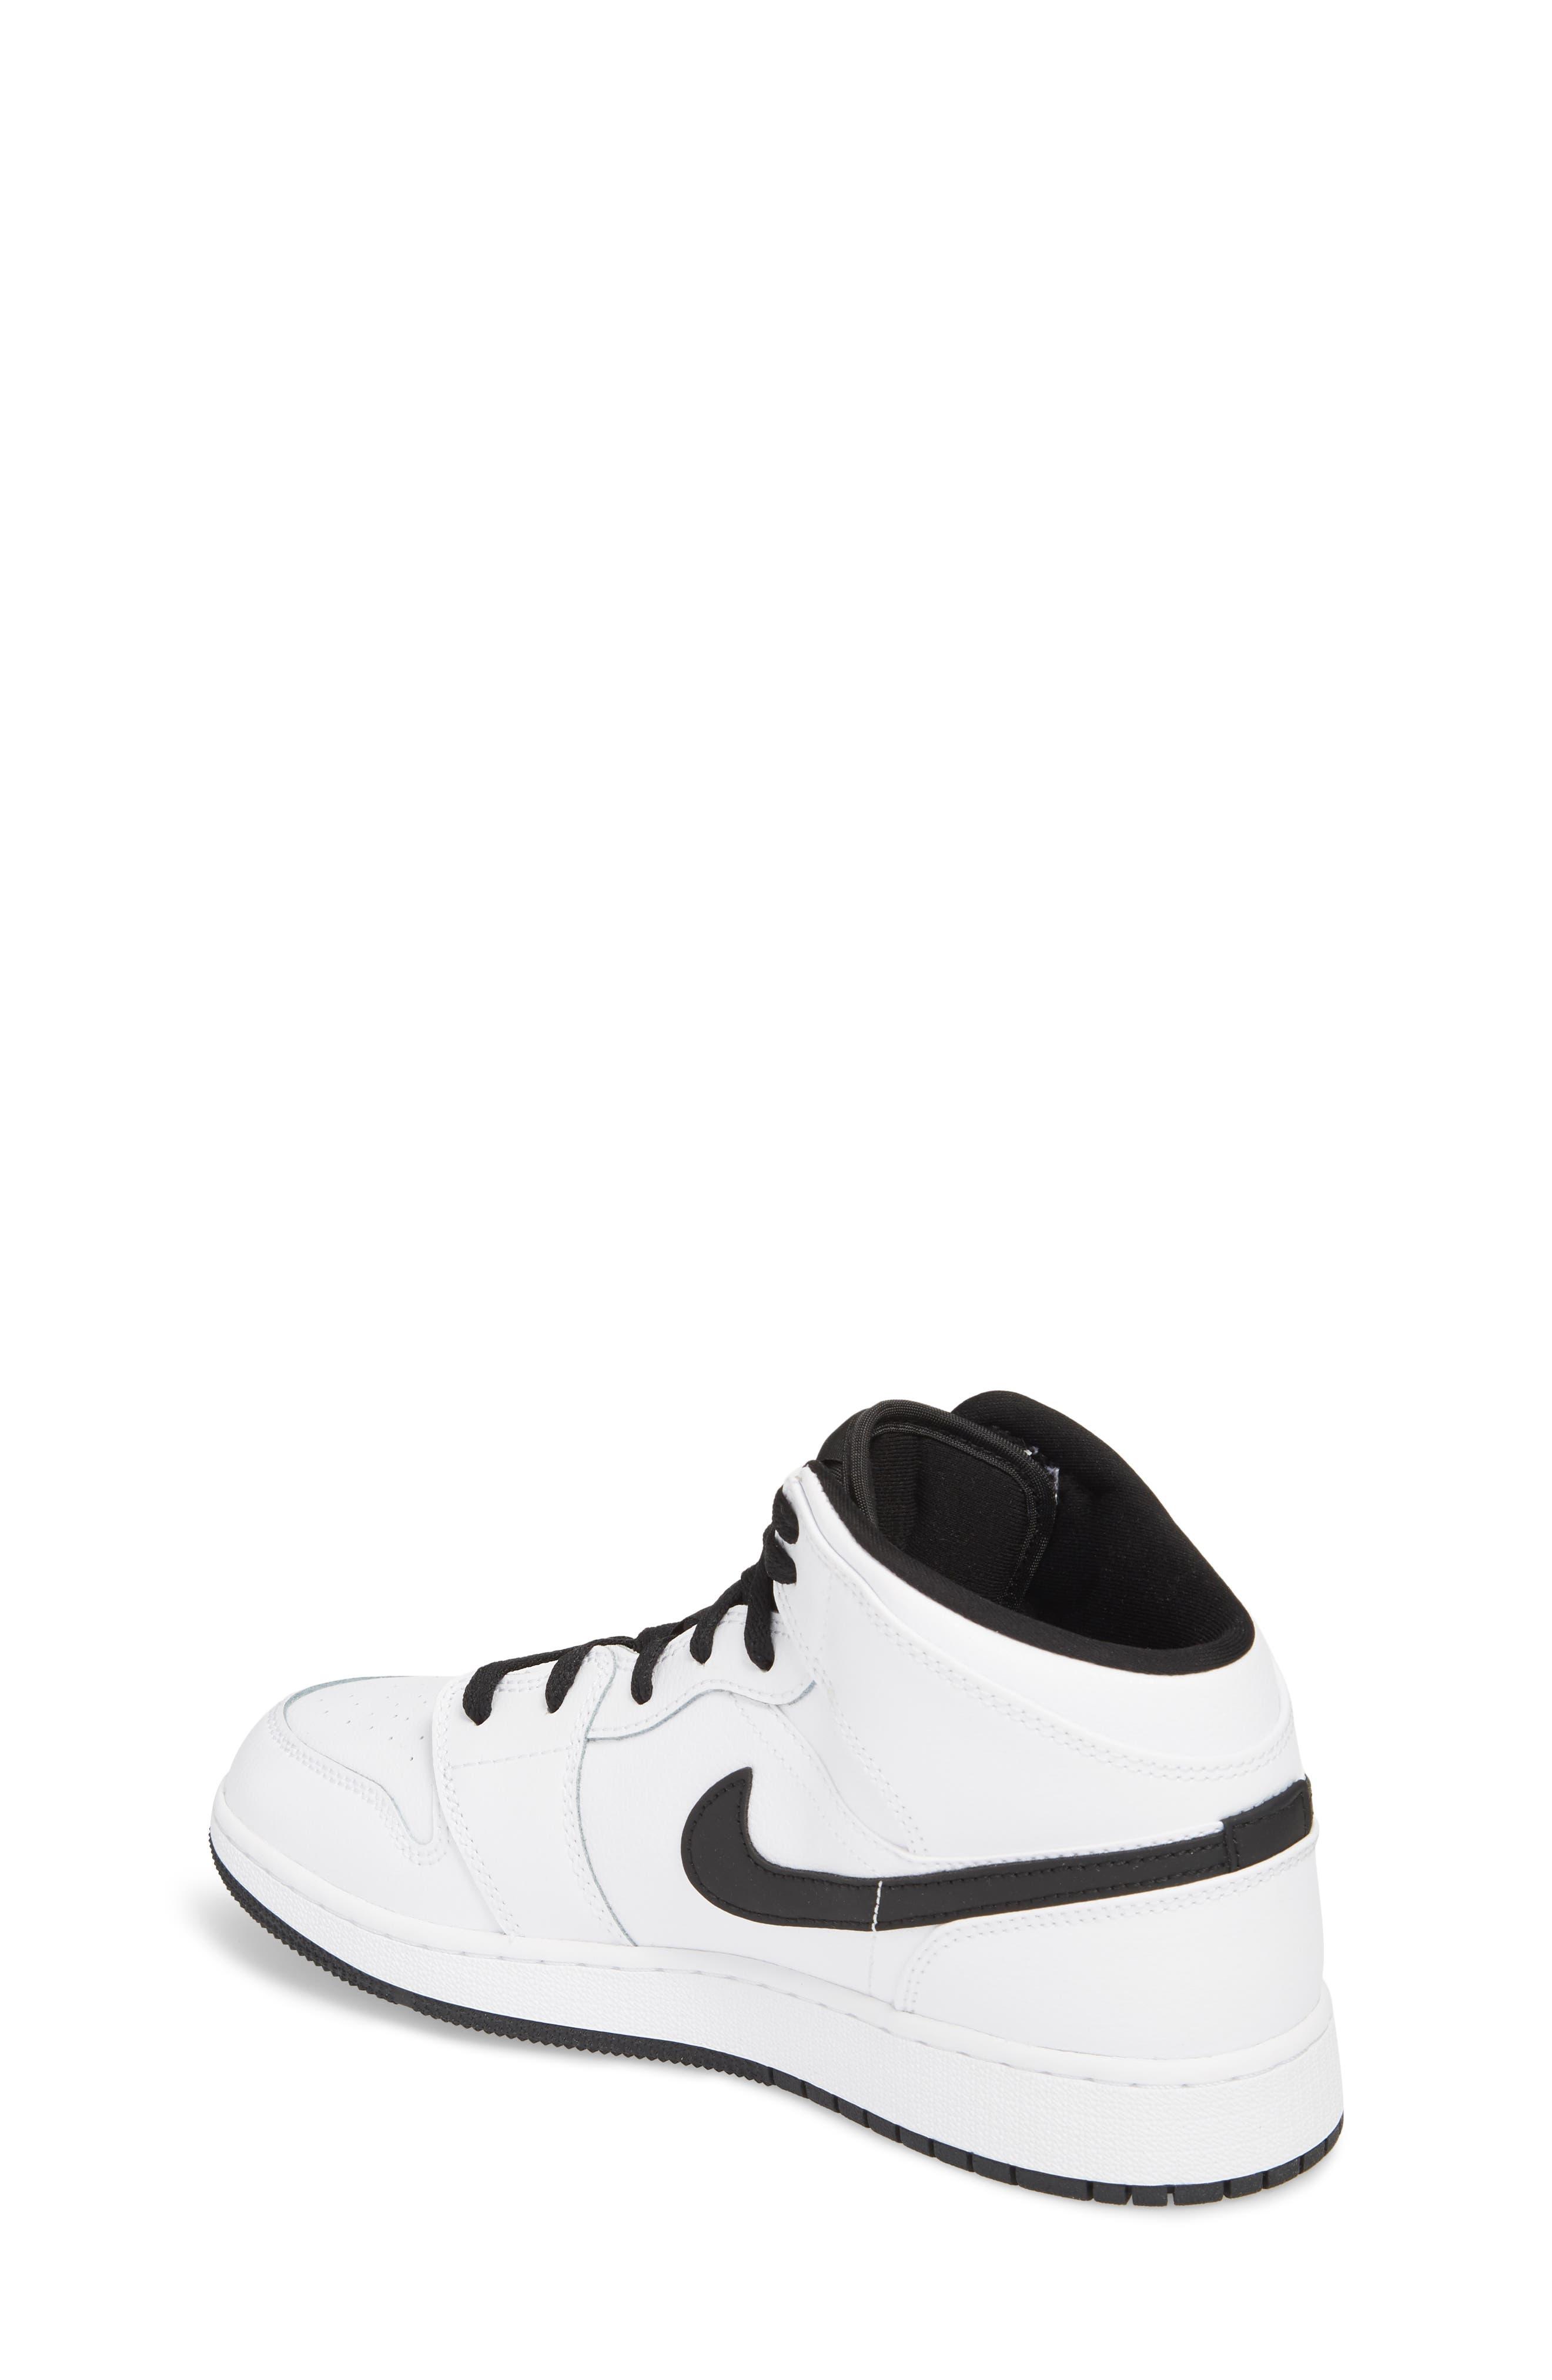 Nike 'Air Jordan 1 Mid' Sneaker,                             Alternate thumbnail 2, color,                             White/ Fuchsia Blast/ Black